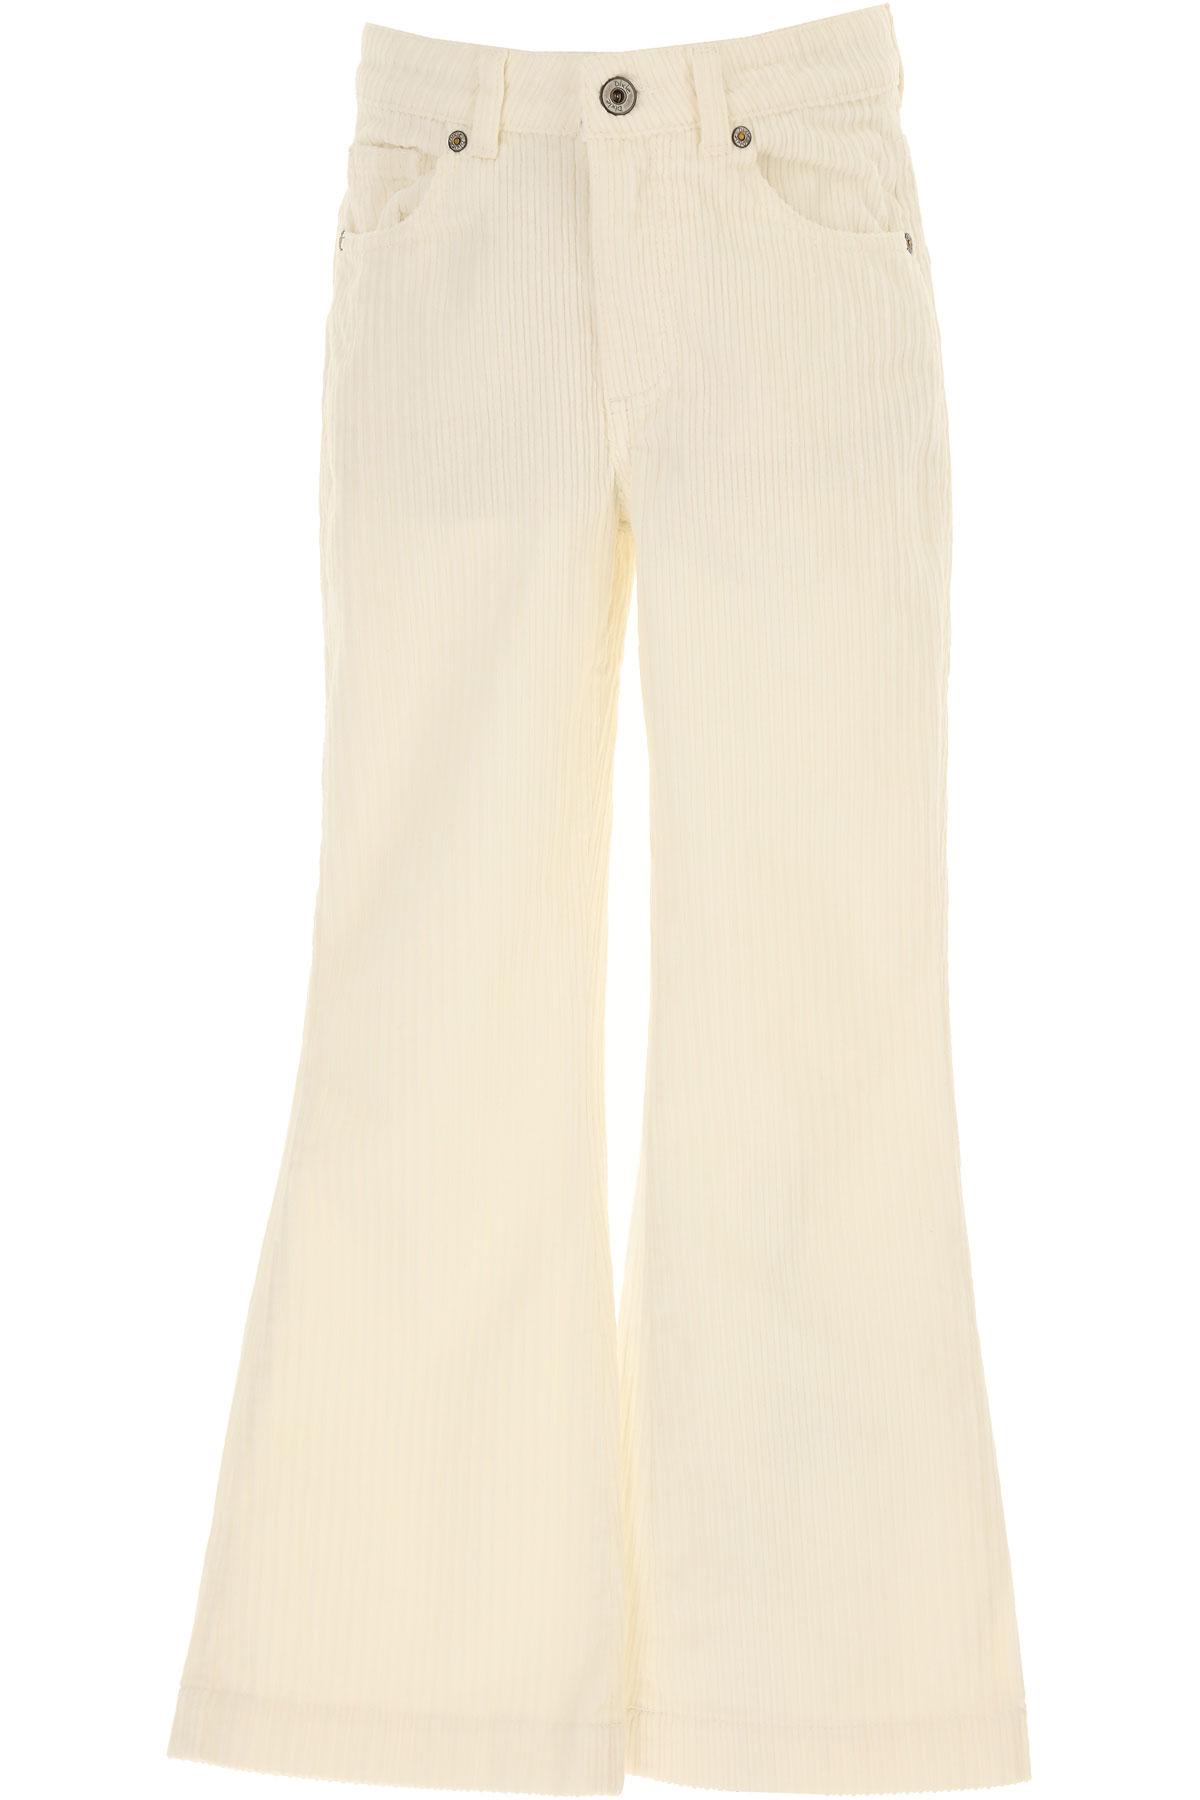 Dixie Kids Pants for Girls On Sale, White, Cotton, 2019, L M XL XXL